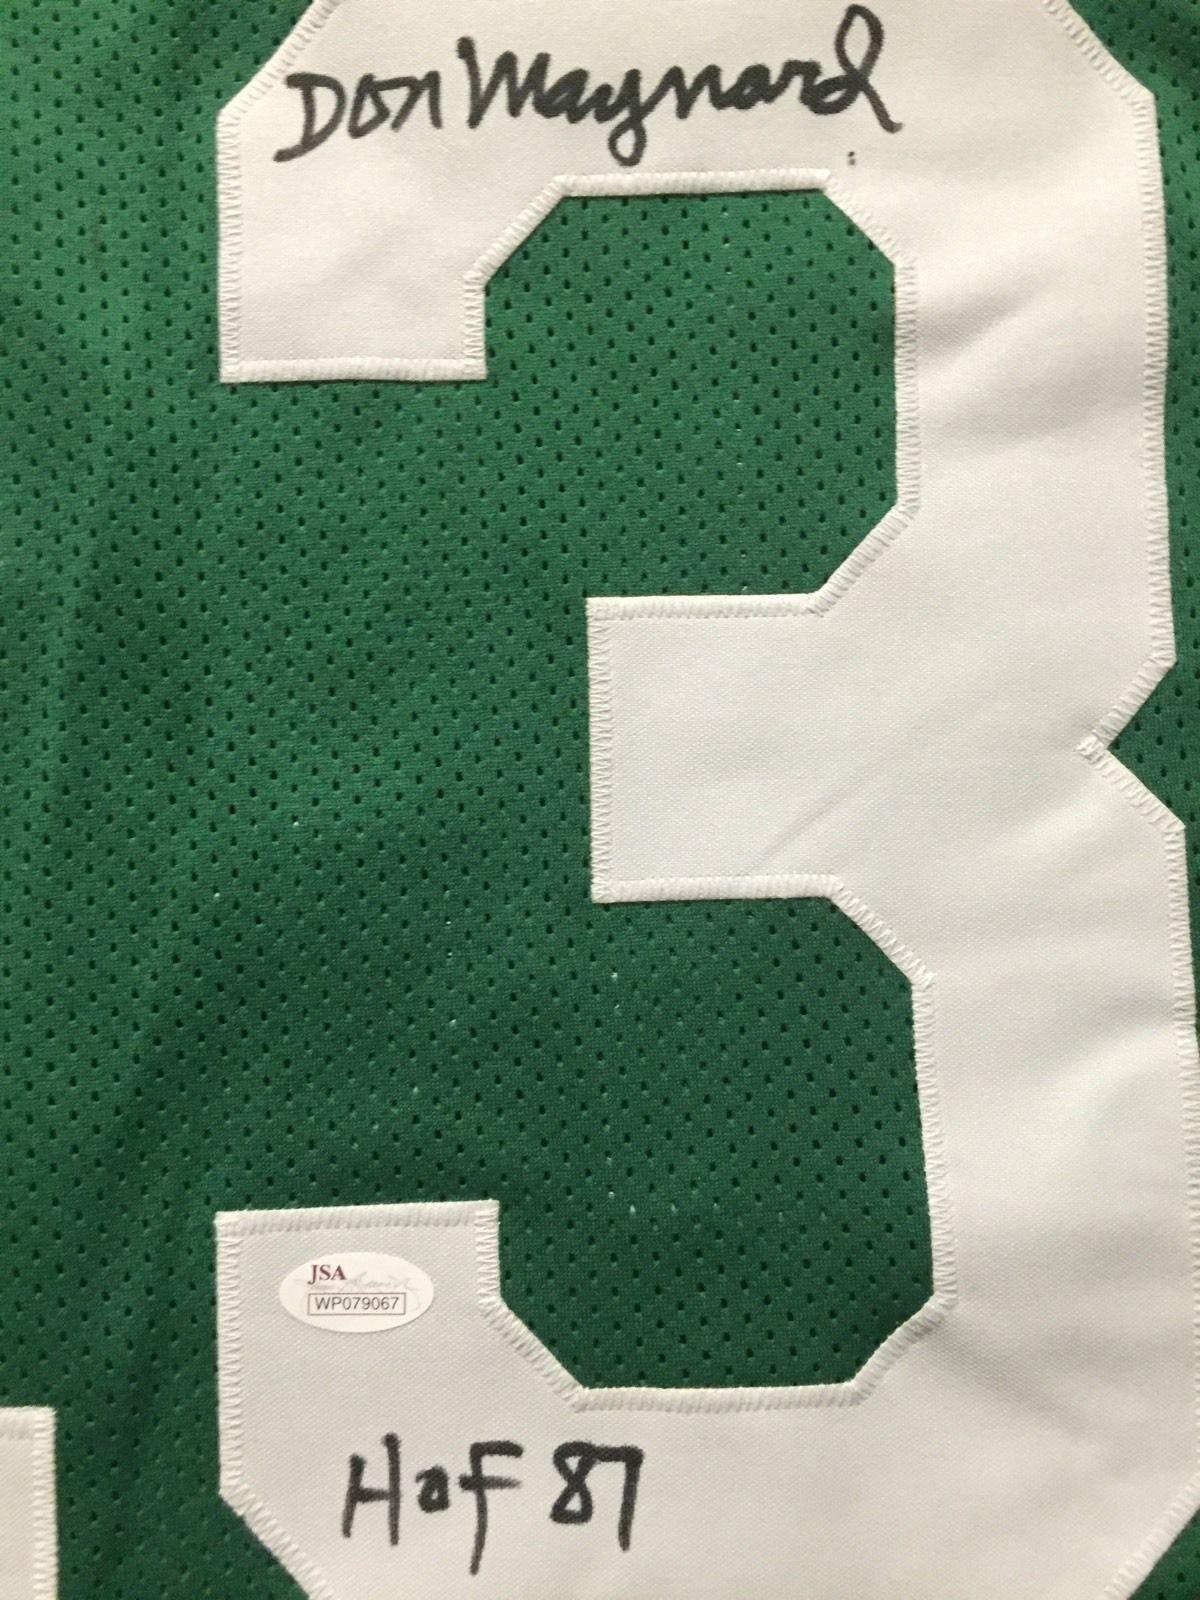 "Autographed/Signed Don Maynard""HOF 87"" New York Green Football Jersey JSA COA"